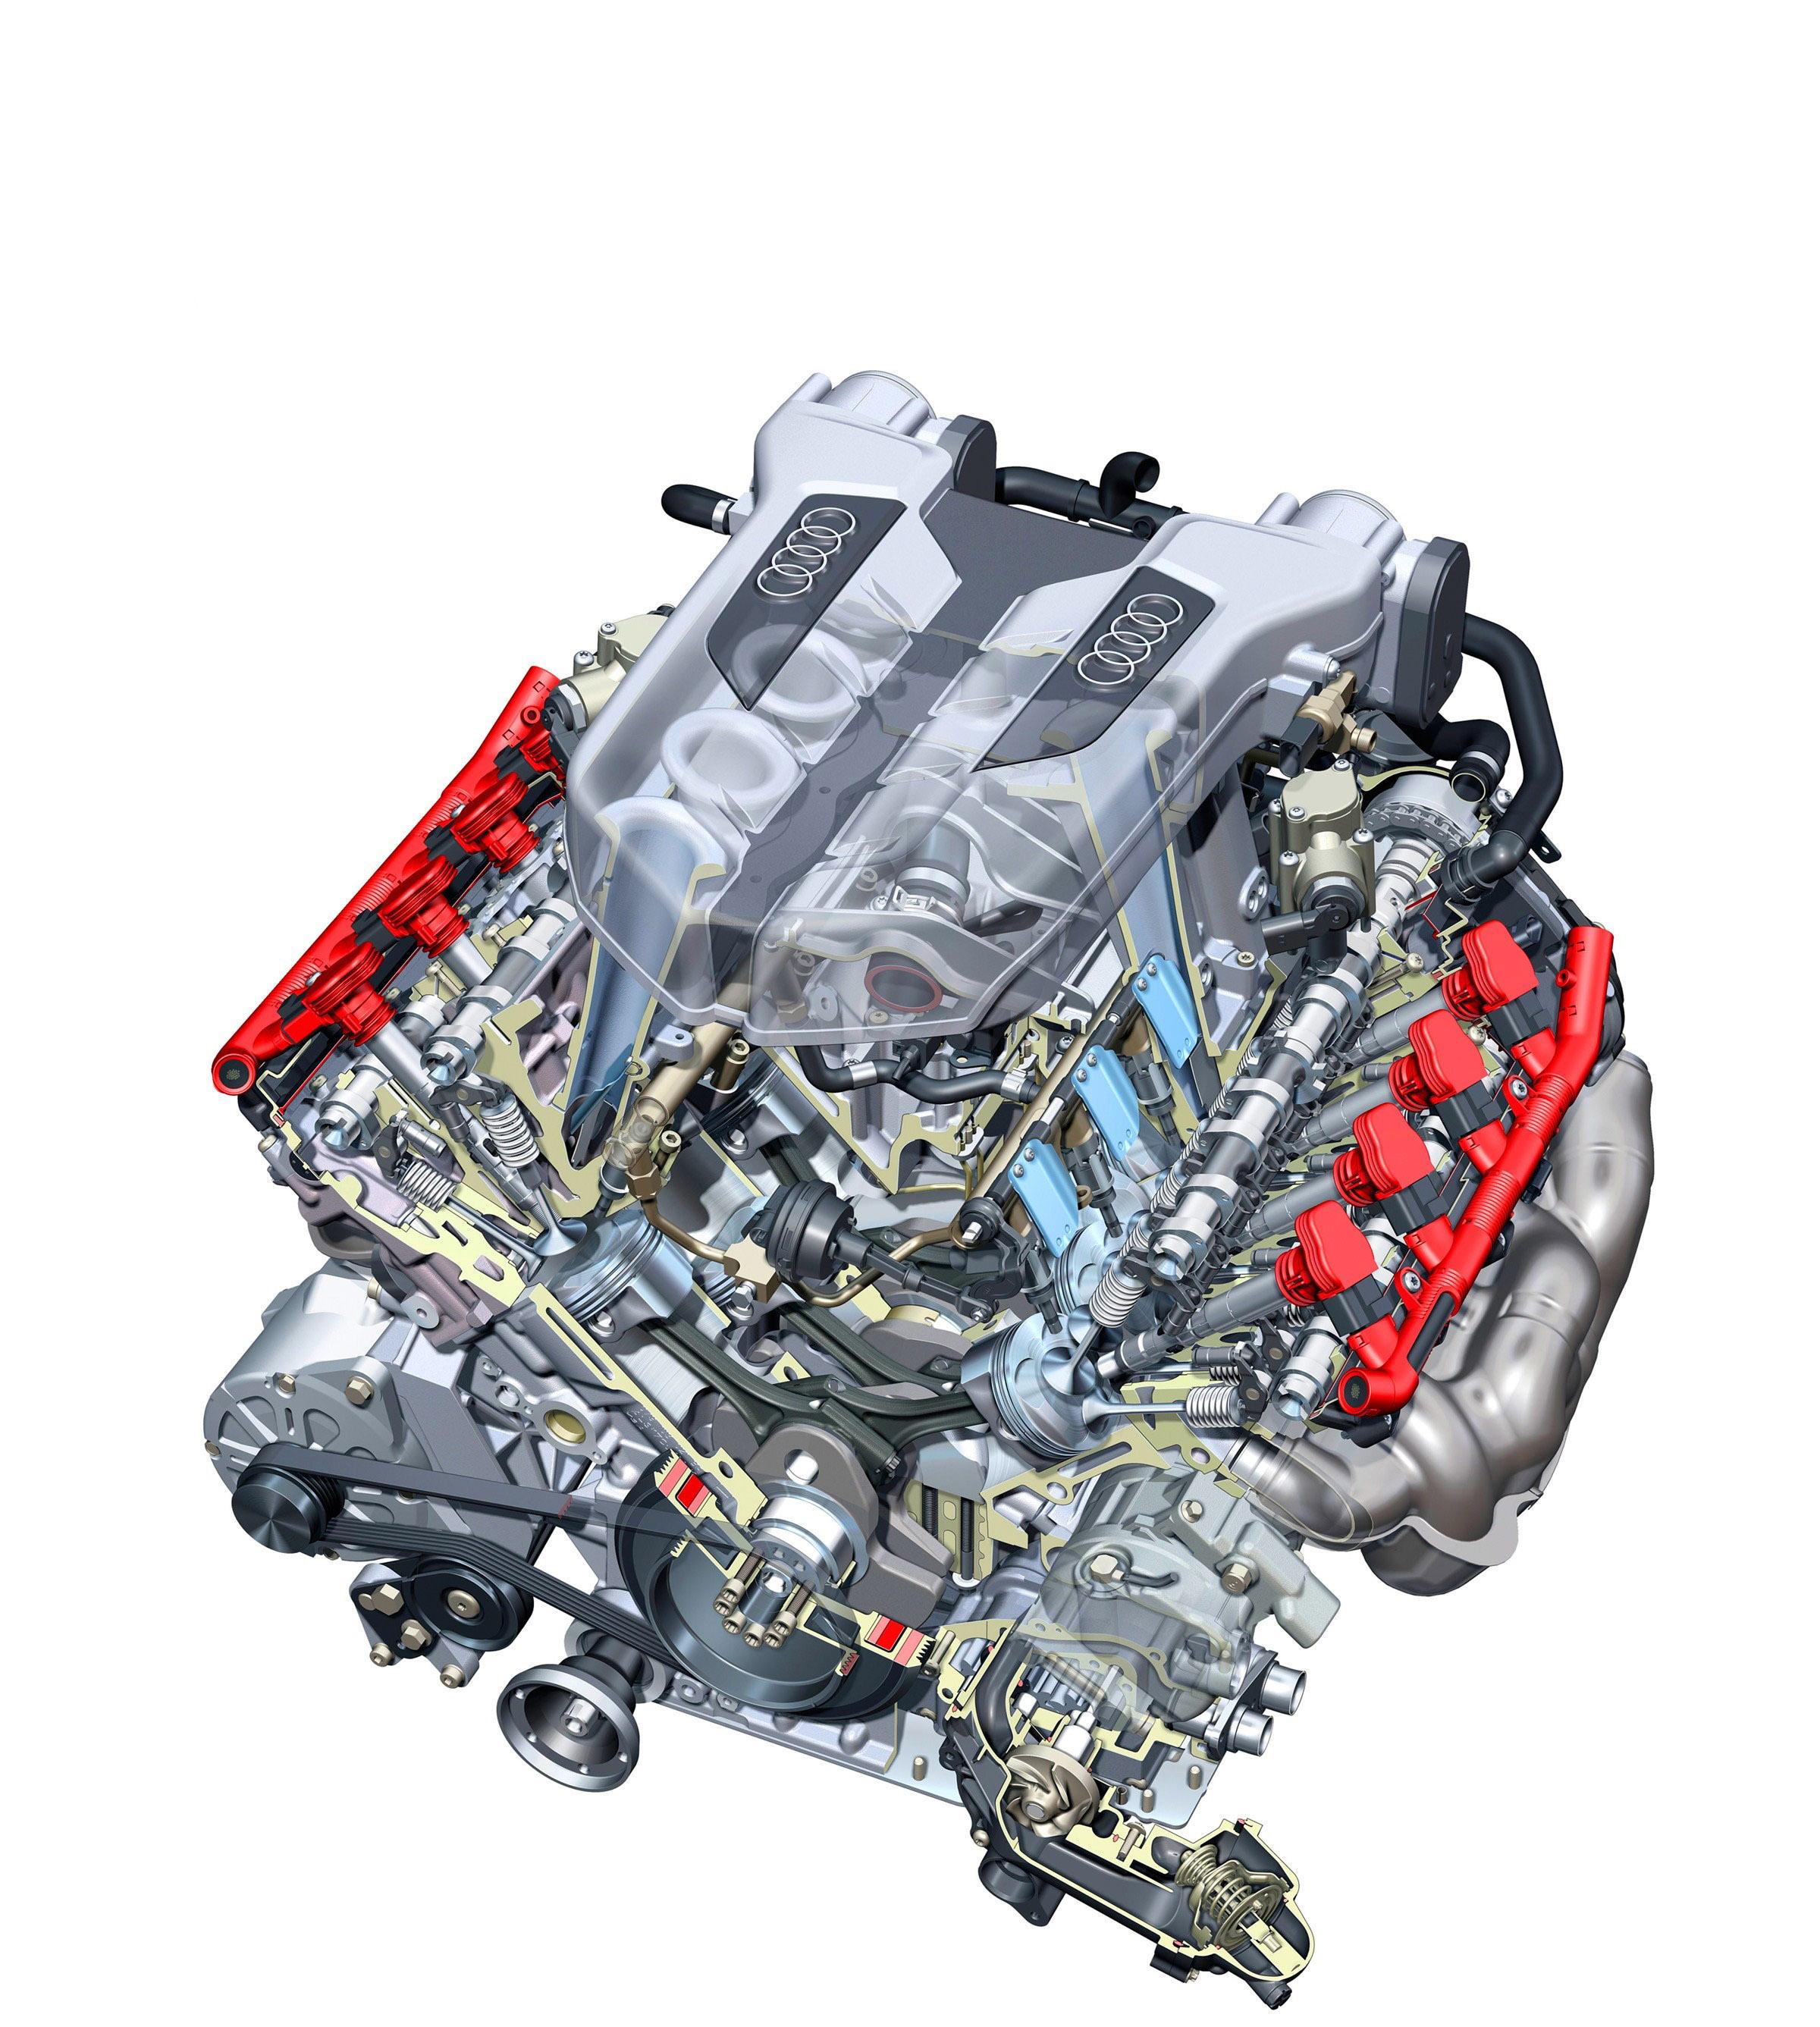 Audi 20t Engine Diagram Trusted Wiring Diagrams 2006 A4 R8 Schematic U2022 1997